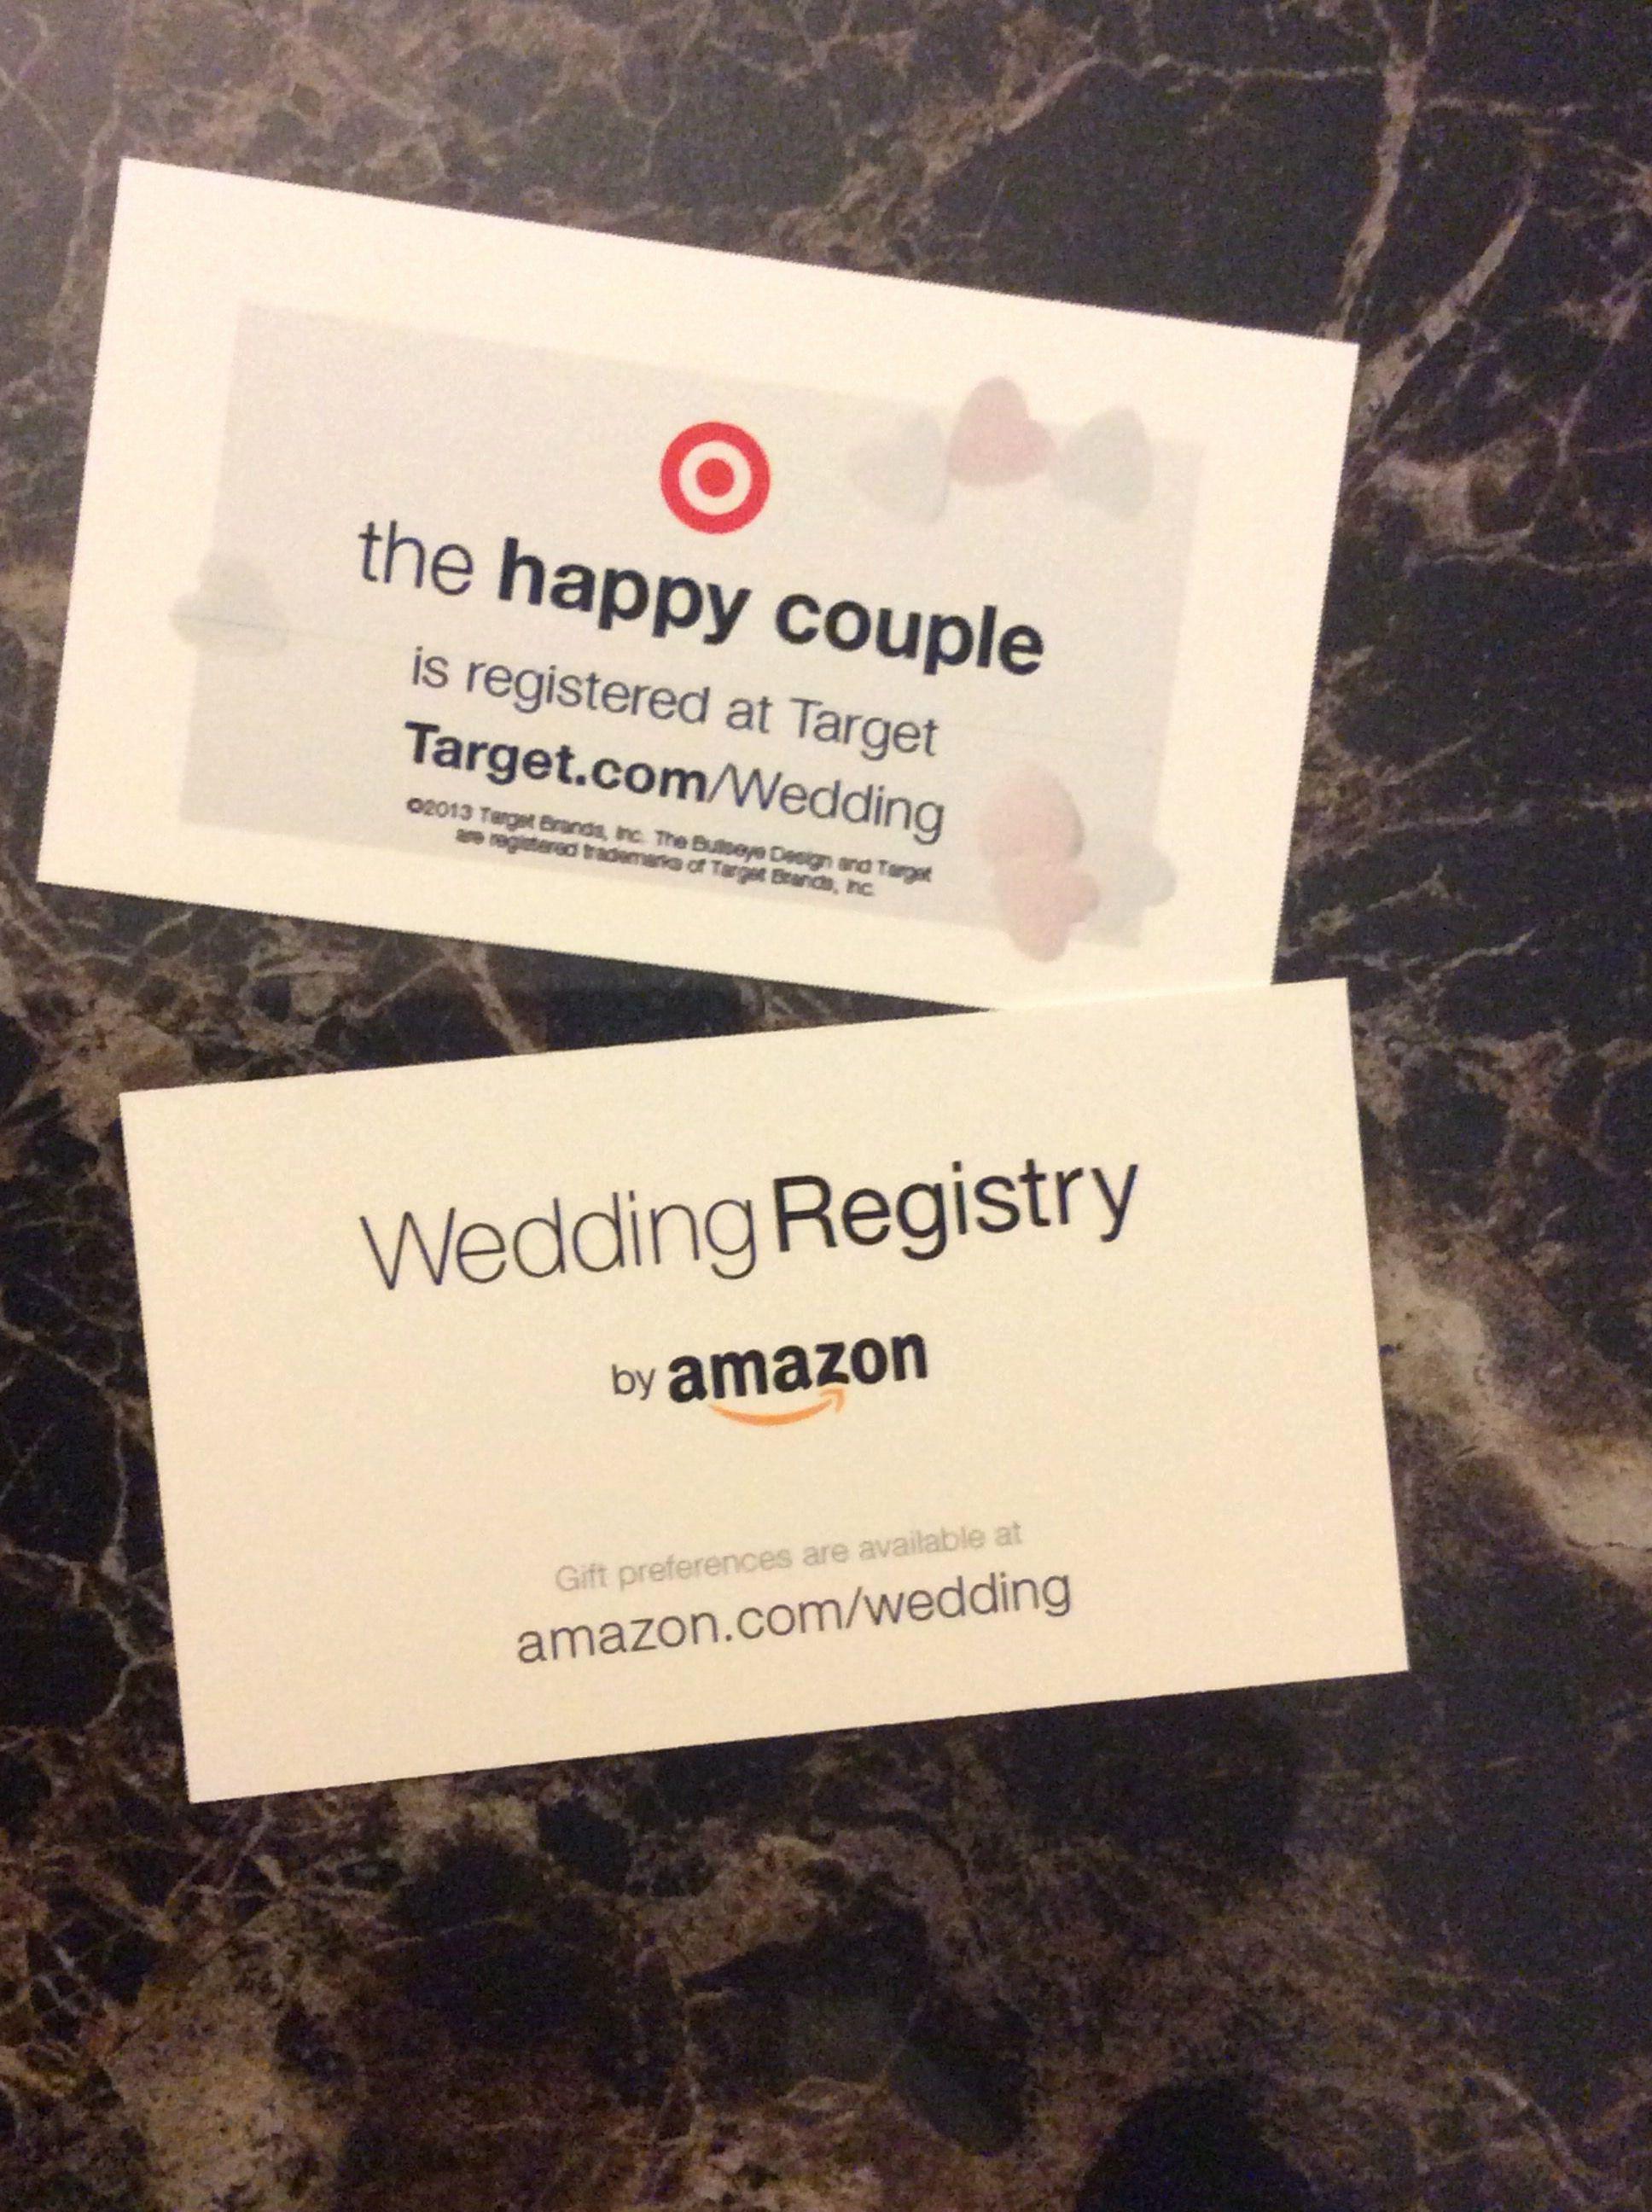 Wedding Registry Card Template Beautiful Wedding Registry Use Business Cards To Let People Know In 2020 Wedding Registry Cards Registry Cards Target Wedding Registry